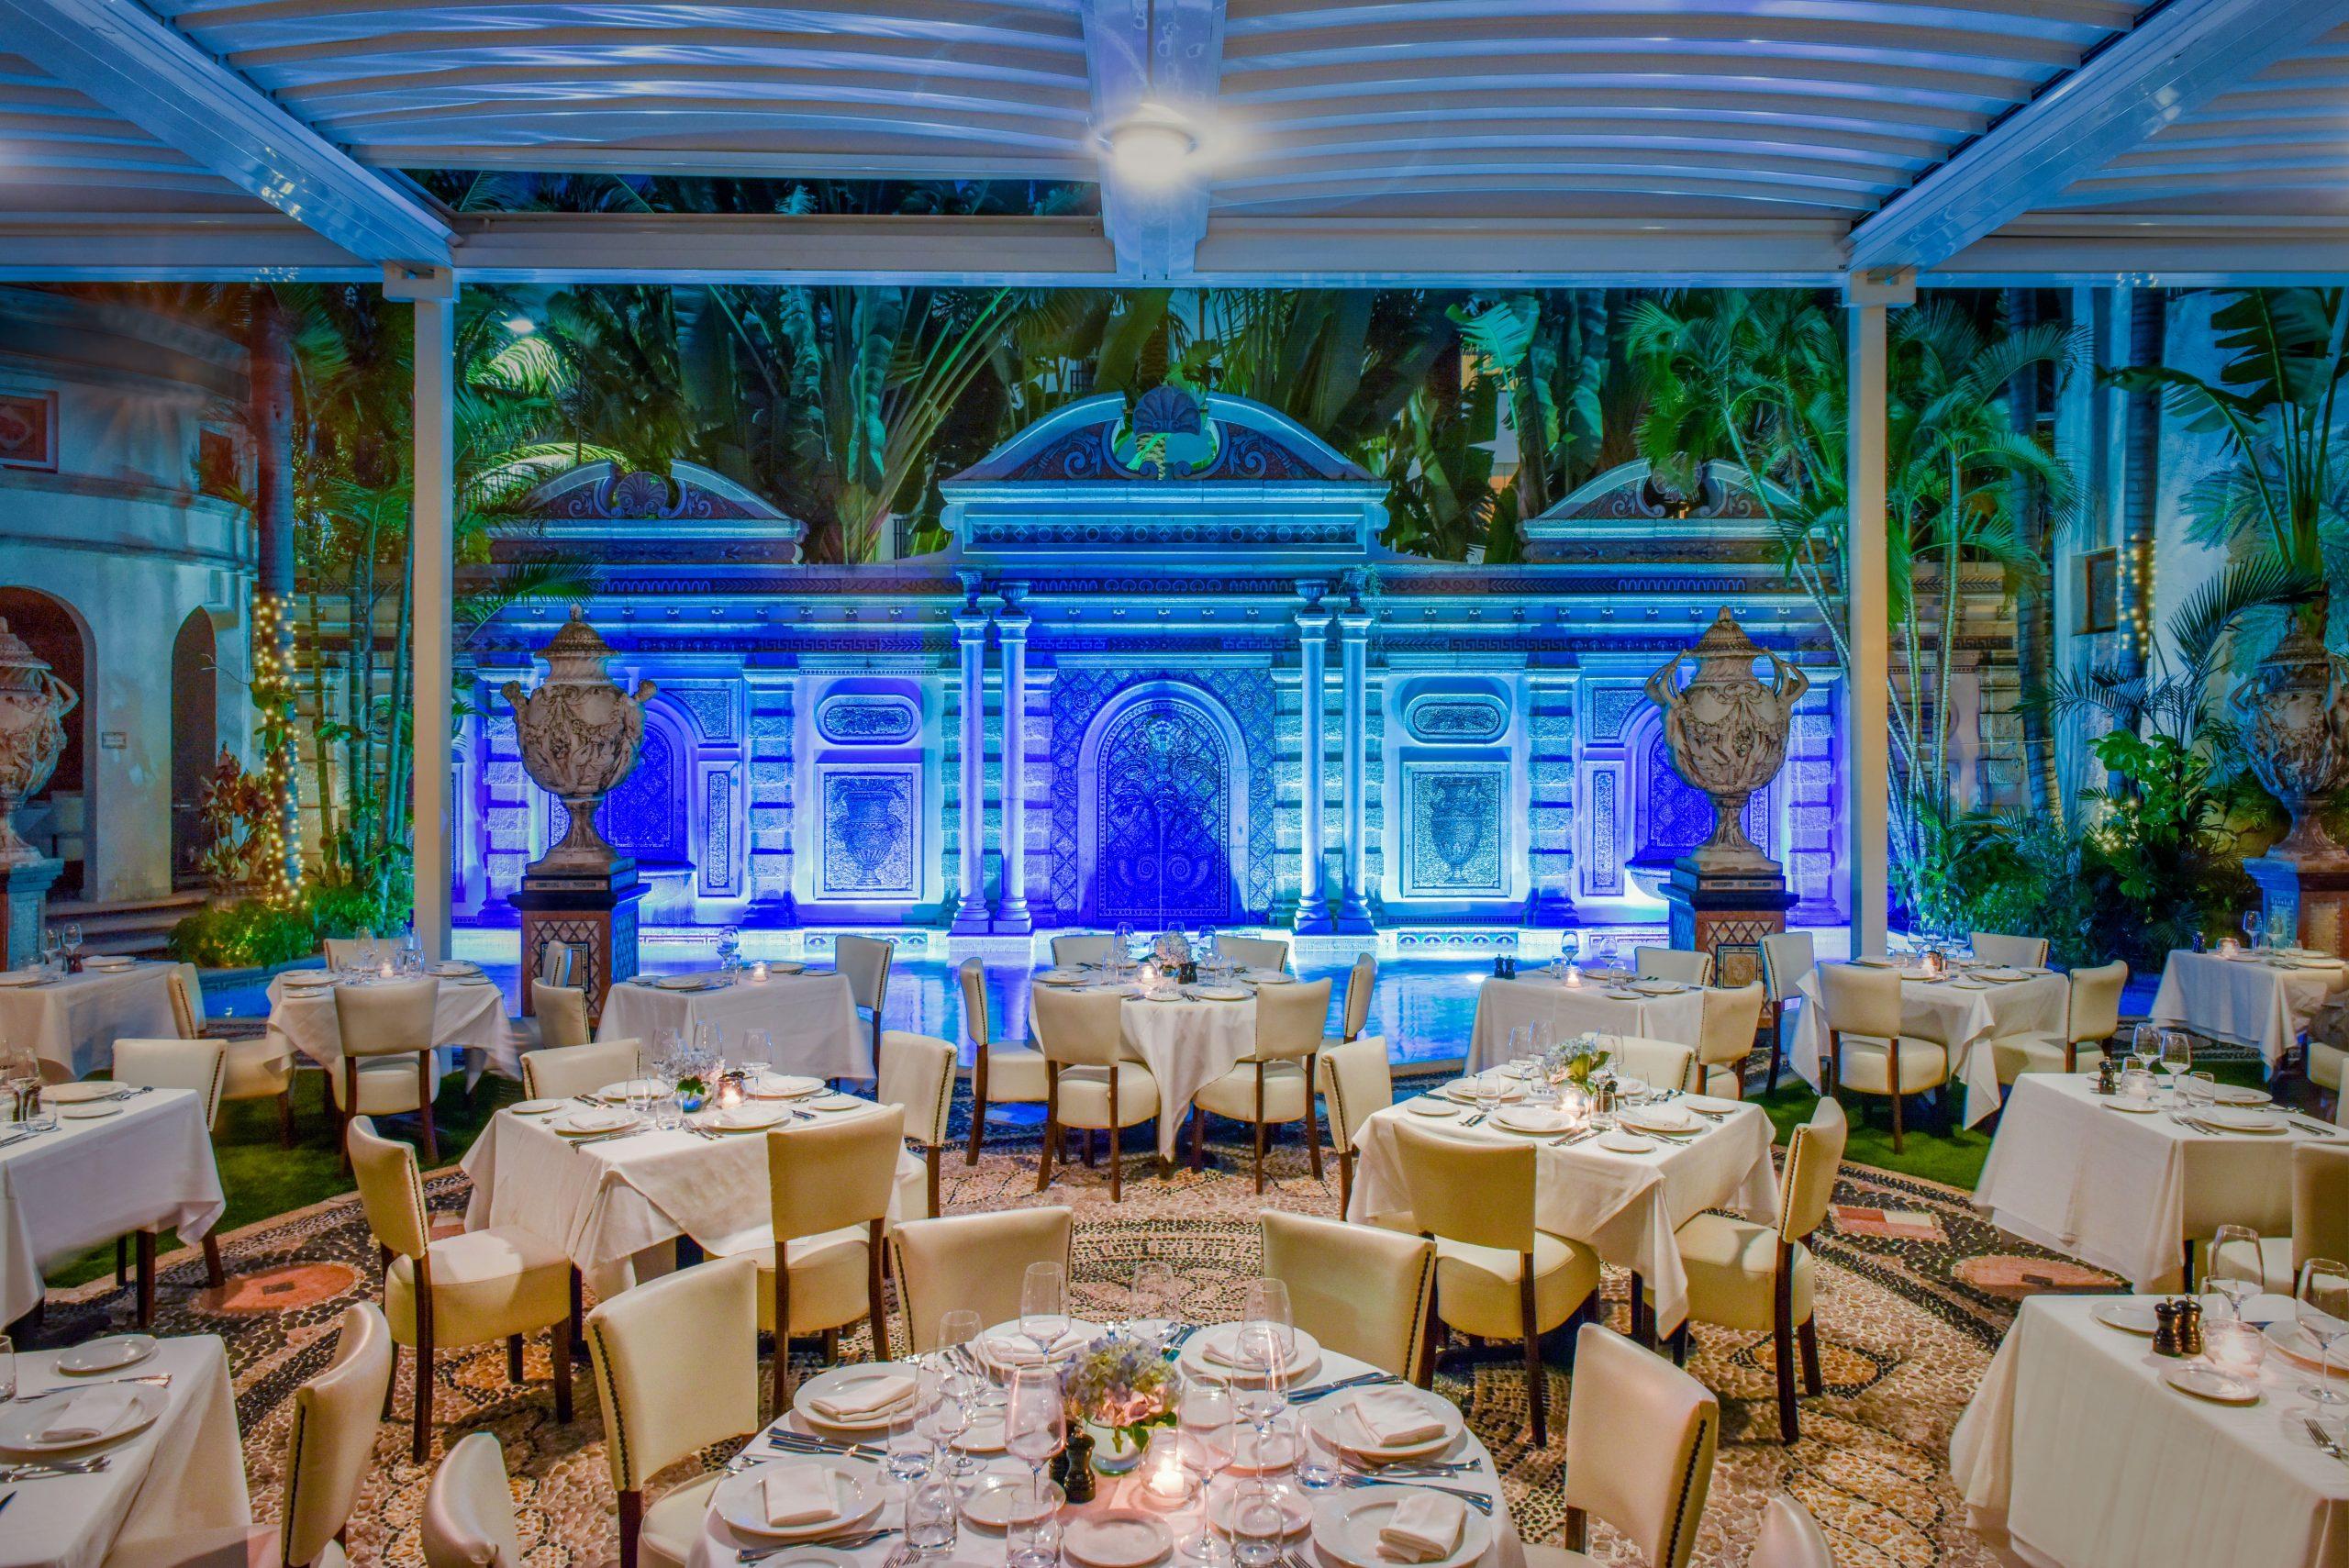 Some of Miami's Most Elegant Restaurants are Offering Thanksgiving Prix Fixe Menus 